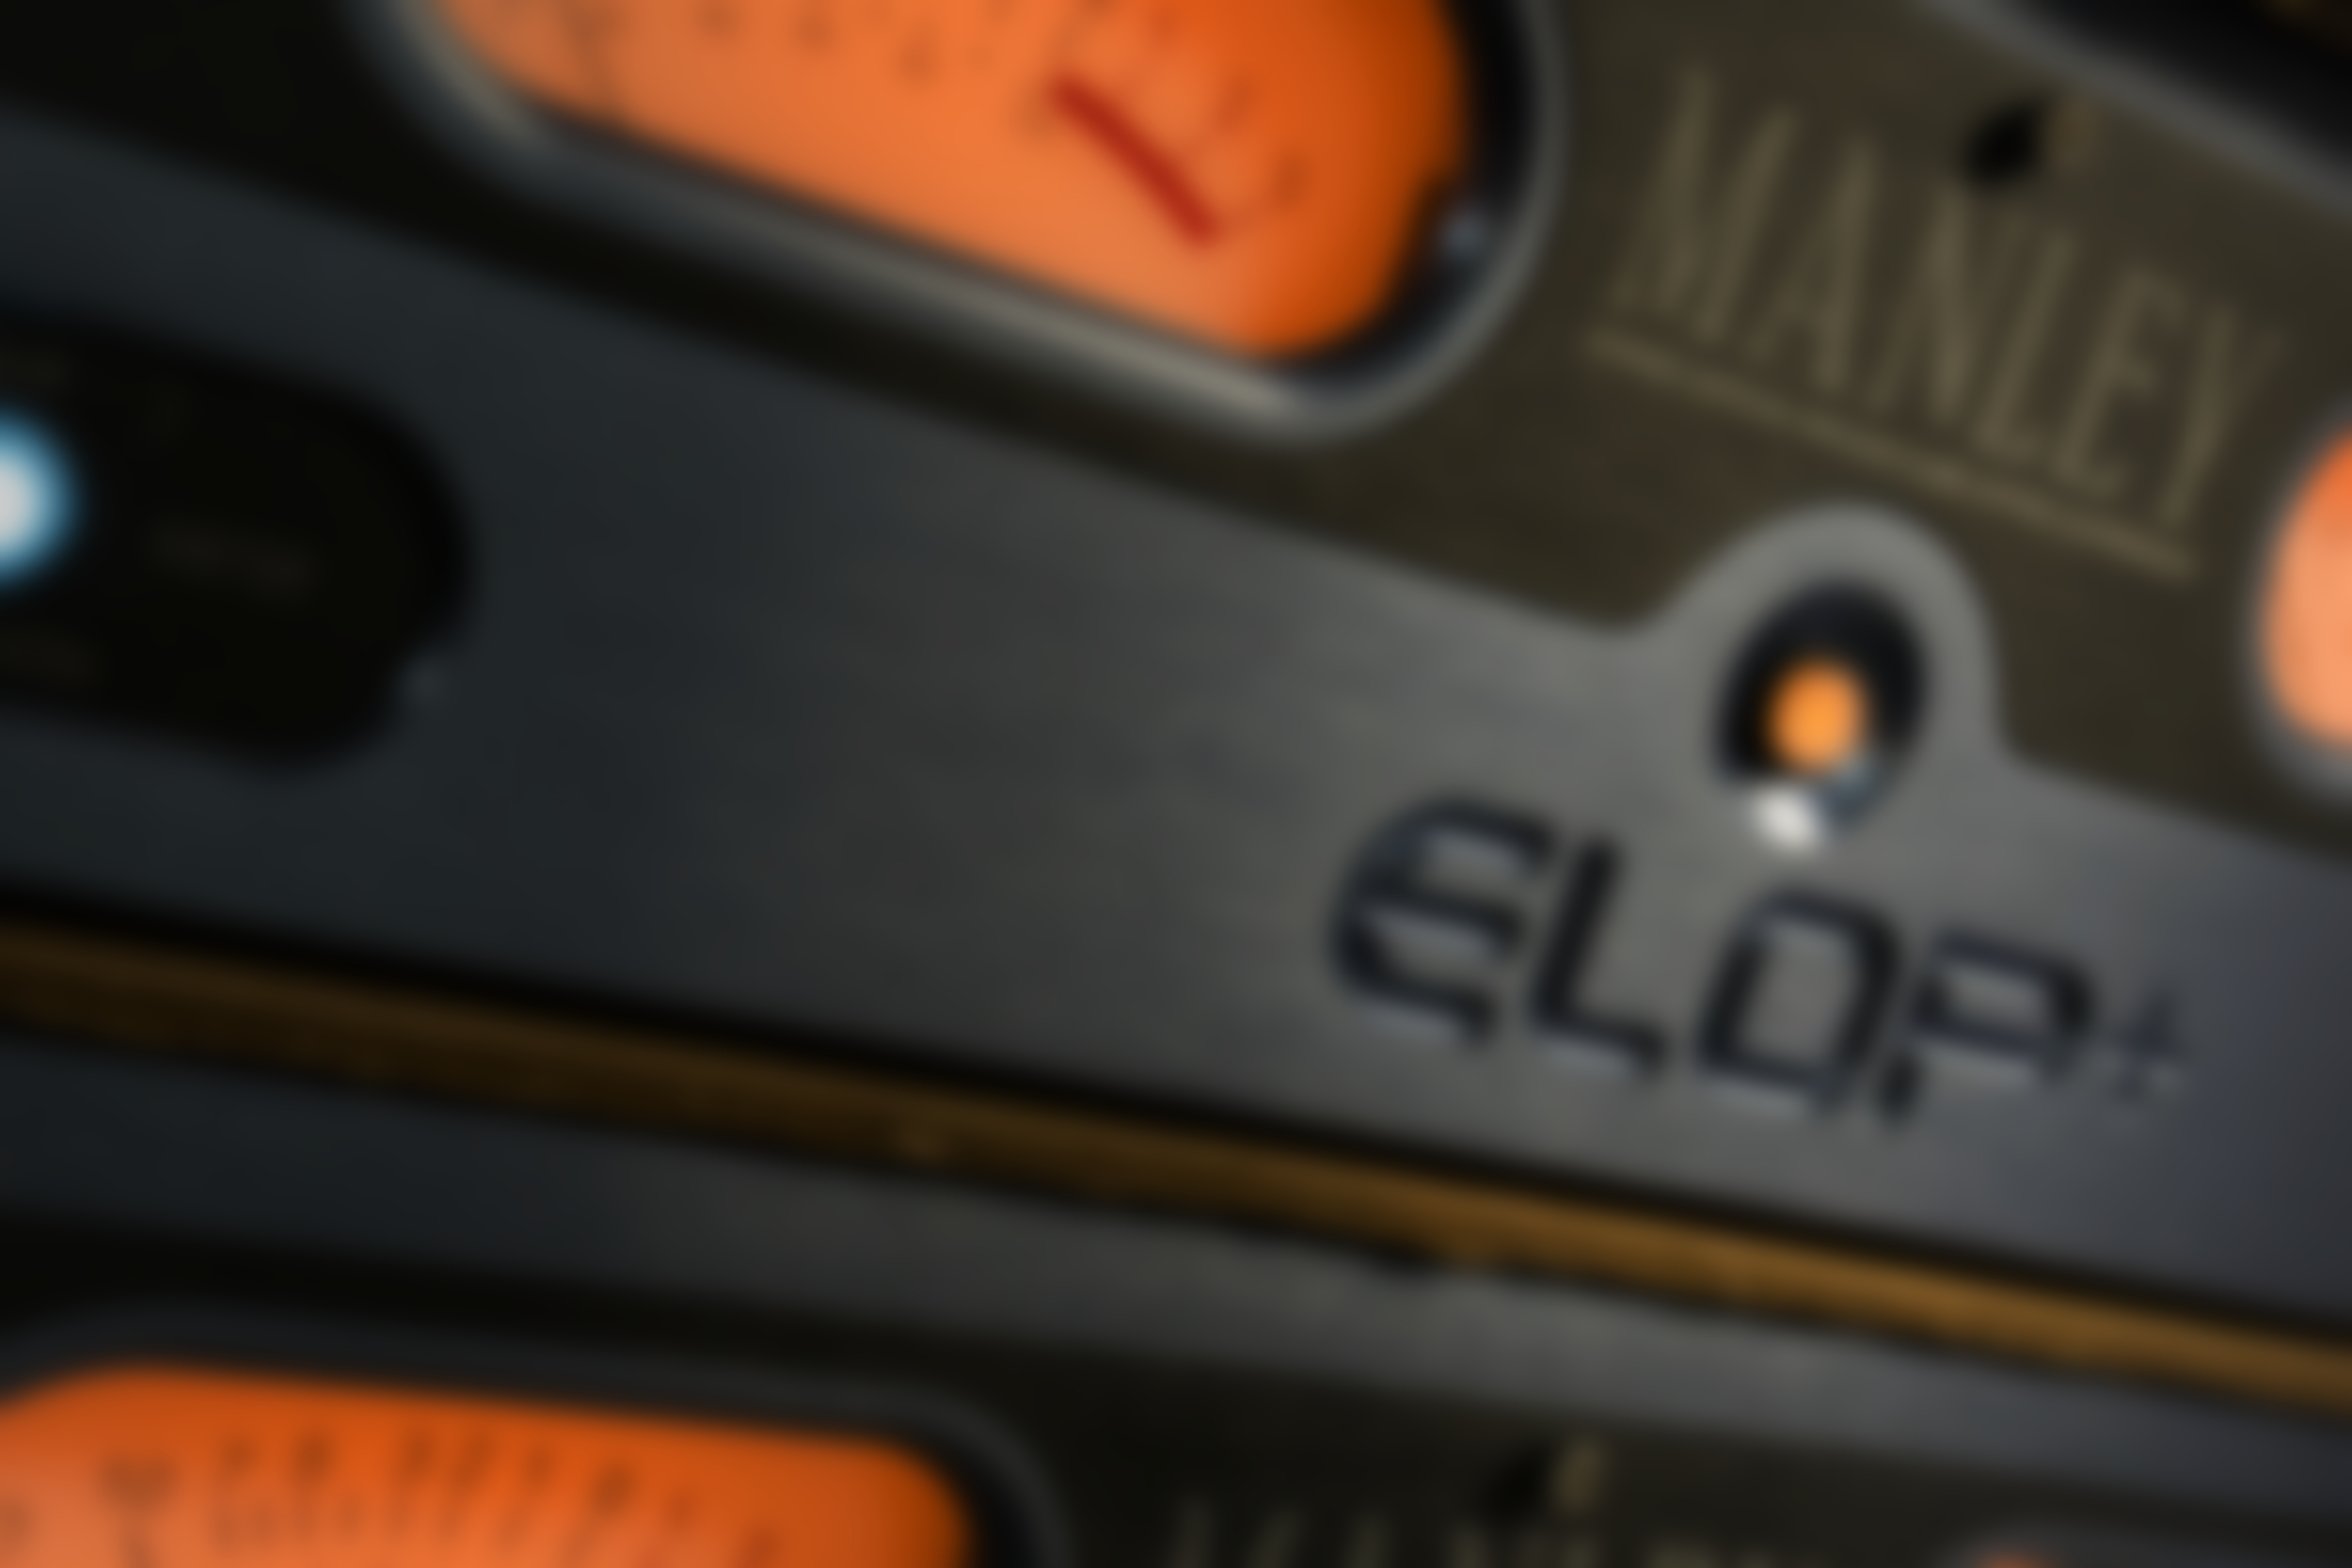 Elop Stereo Limiter Compressor Manley Laboratories Inc Noise Circuit Melpp Index 1